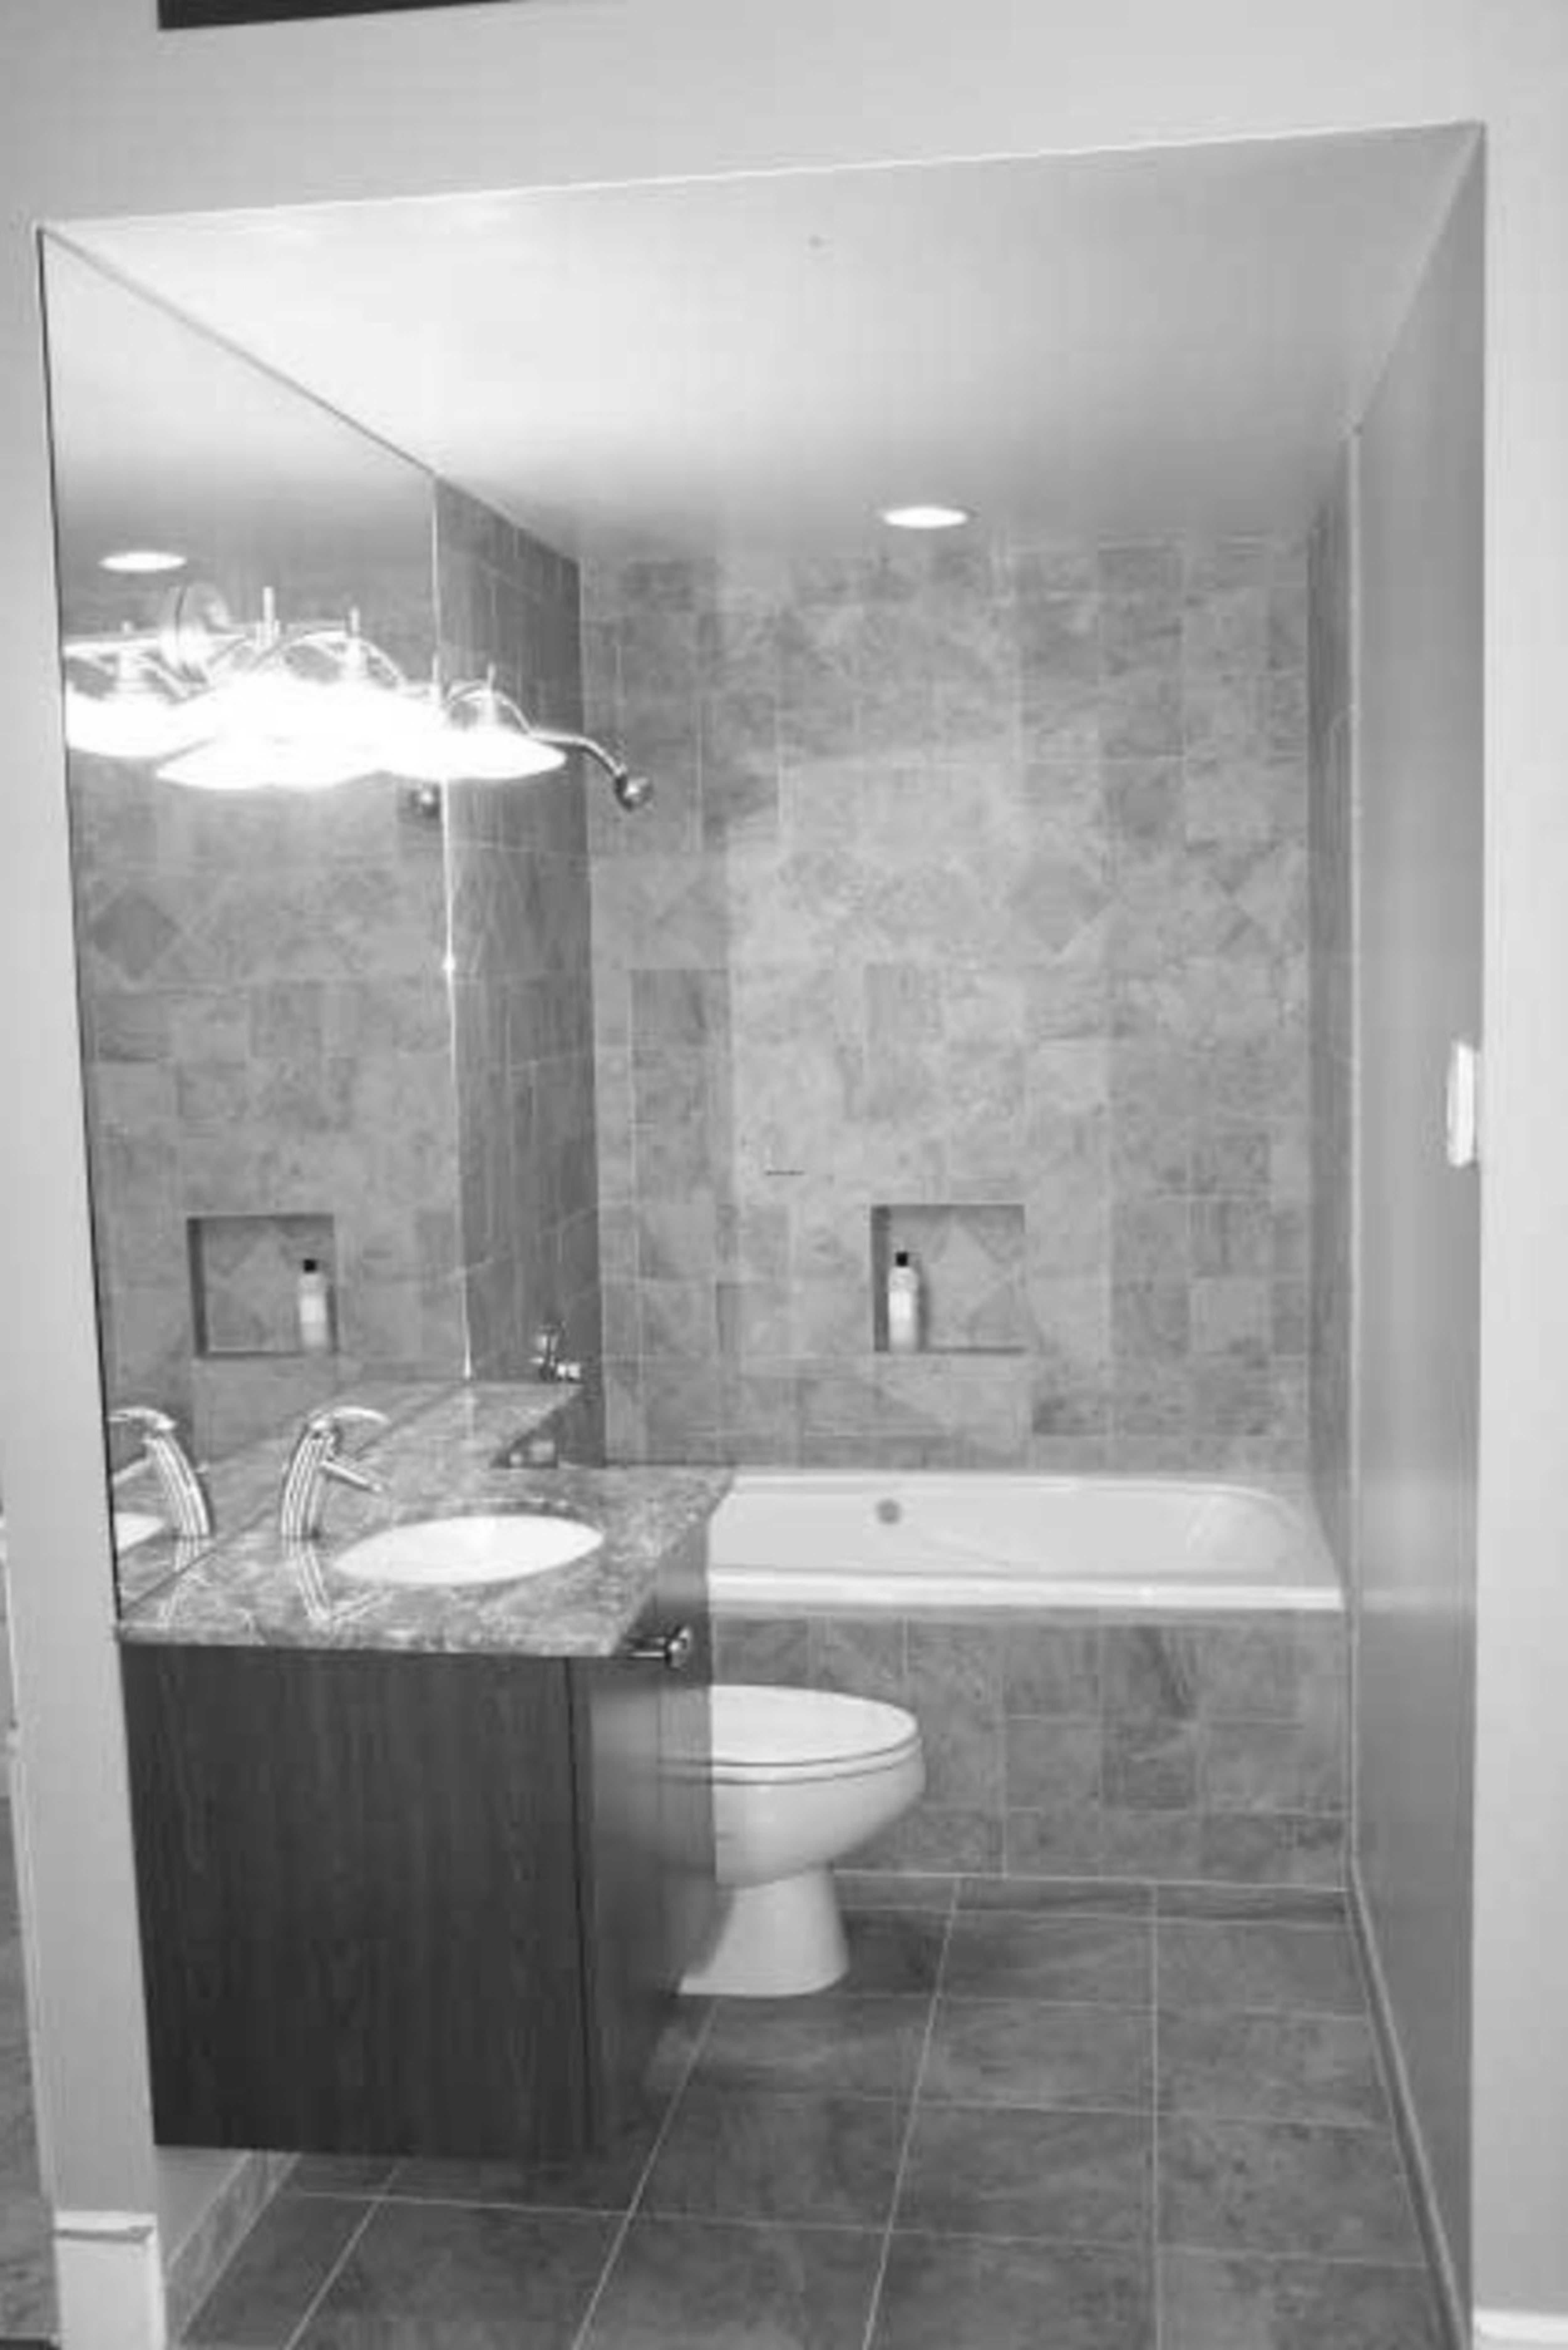 Very Tiny Bathroom Ideas Spectacular Bathroom Ideas Without Bathtub Small Bathroom Remodel Bathroom Remodel Cost Small Bathroom Renovations